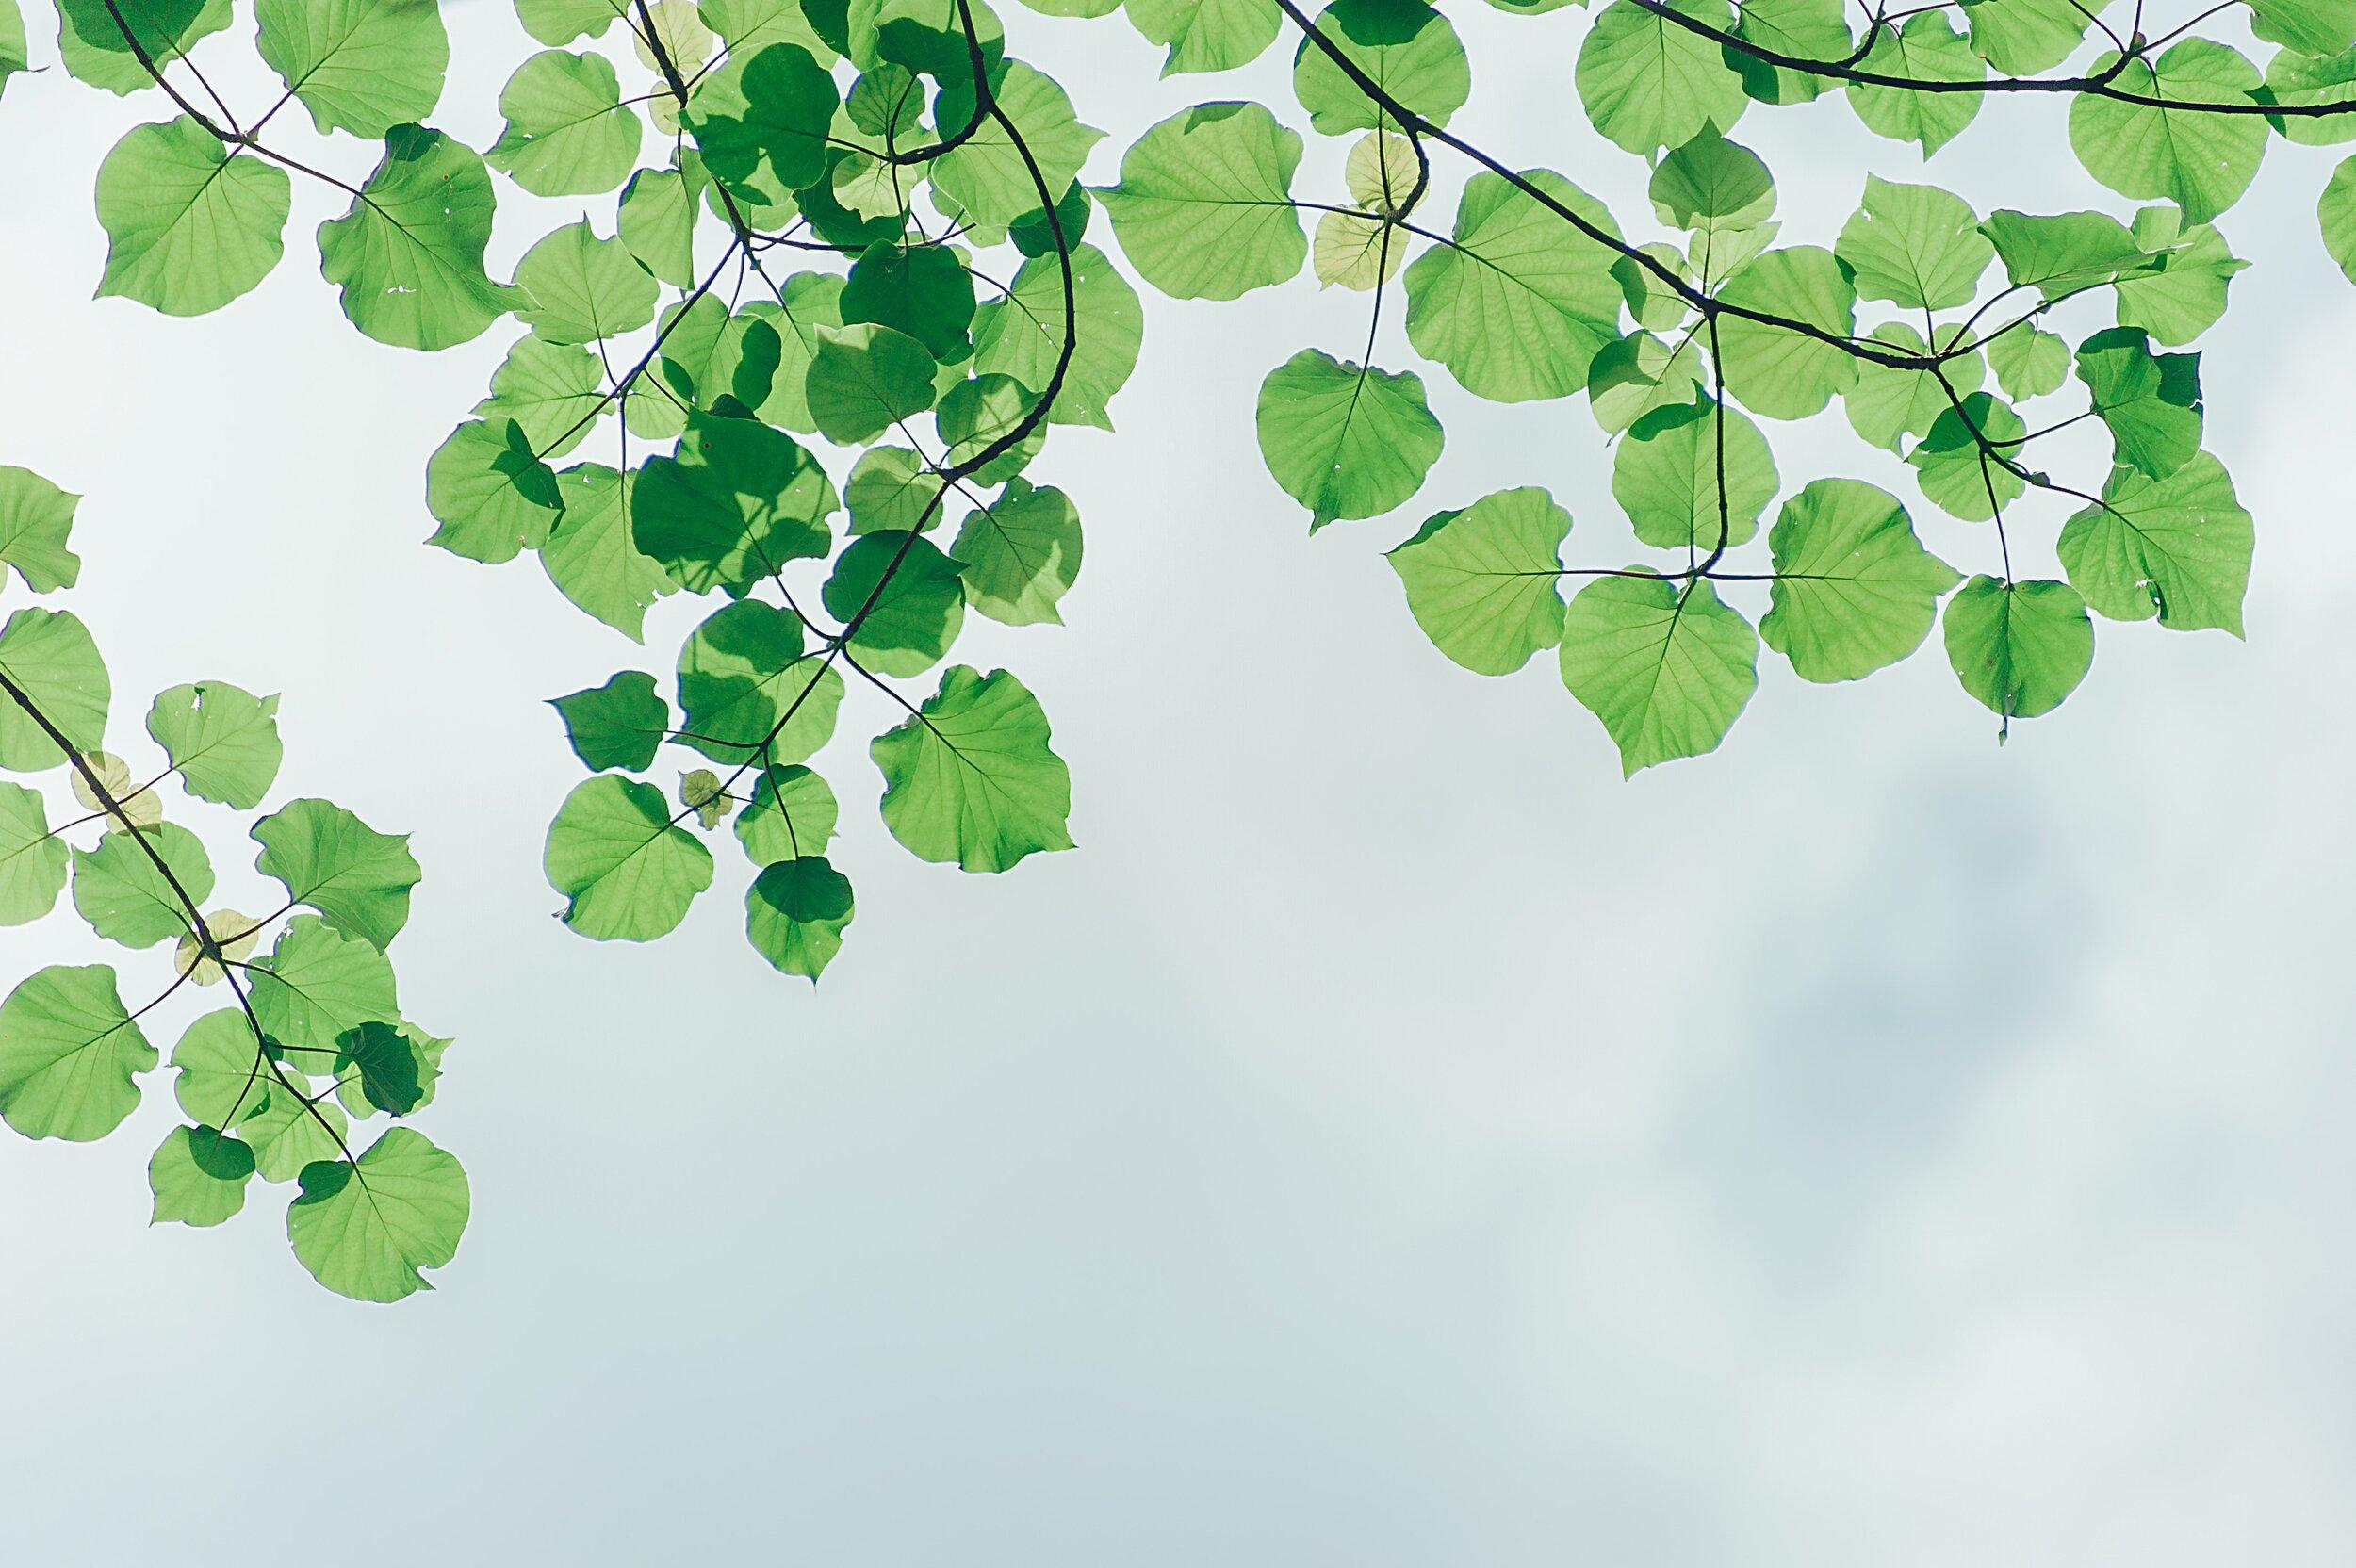 branches-cloudy-environment-1131458.jpg